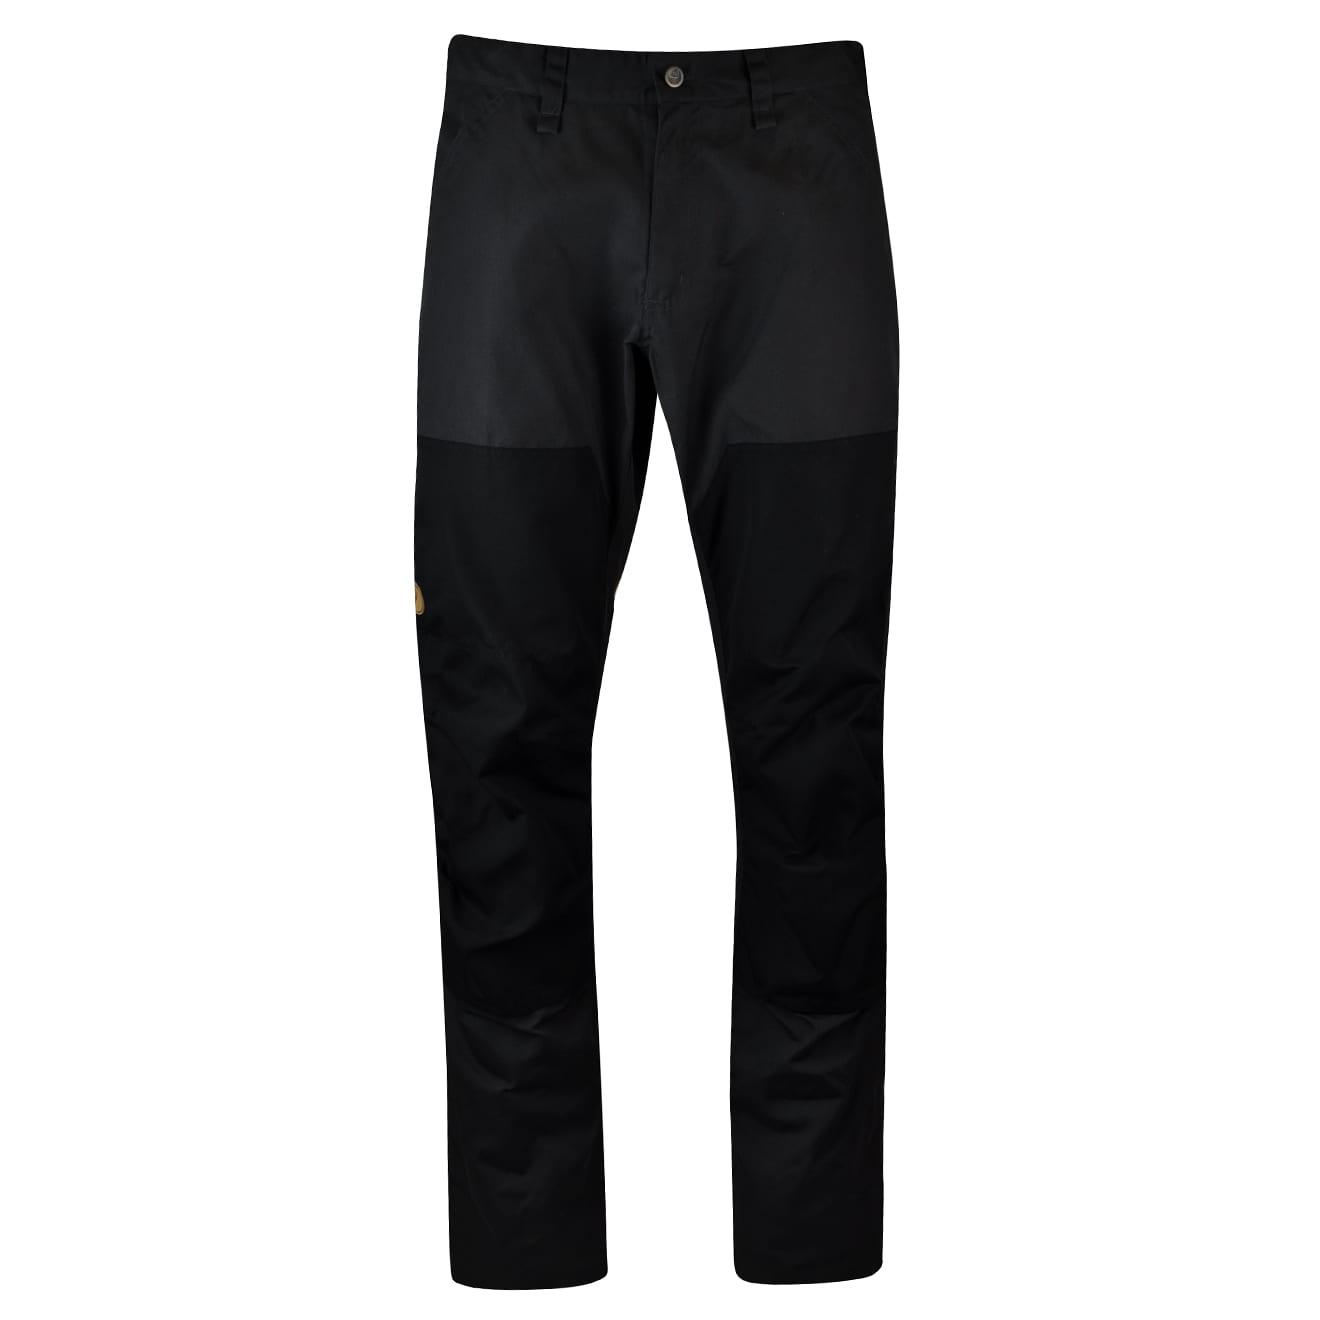 Fjallraven barents pro jeans dark grey black